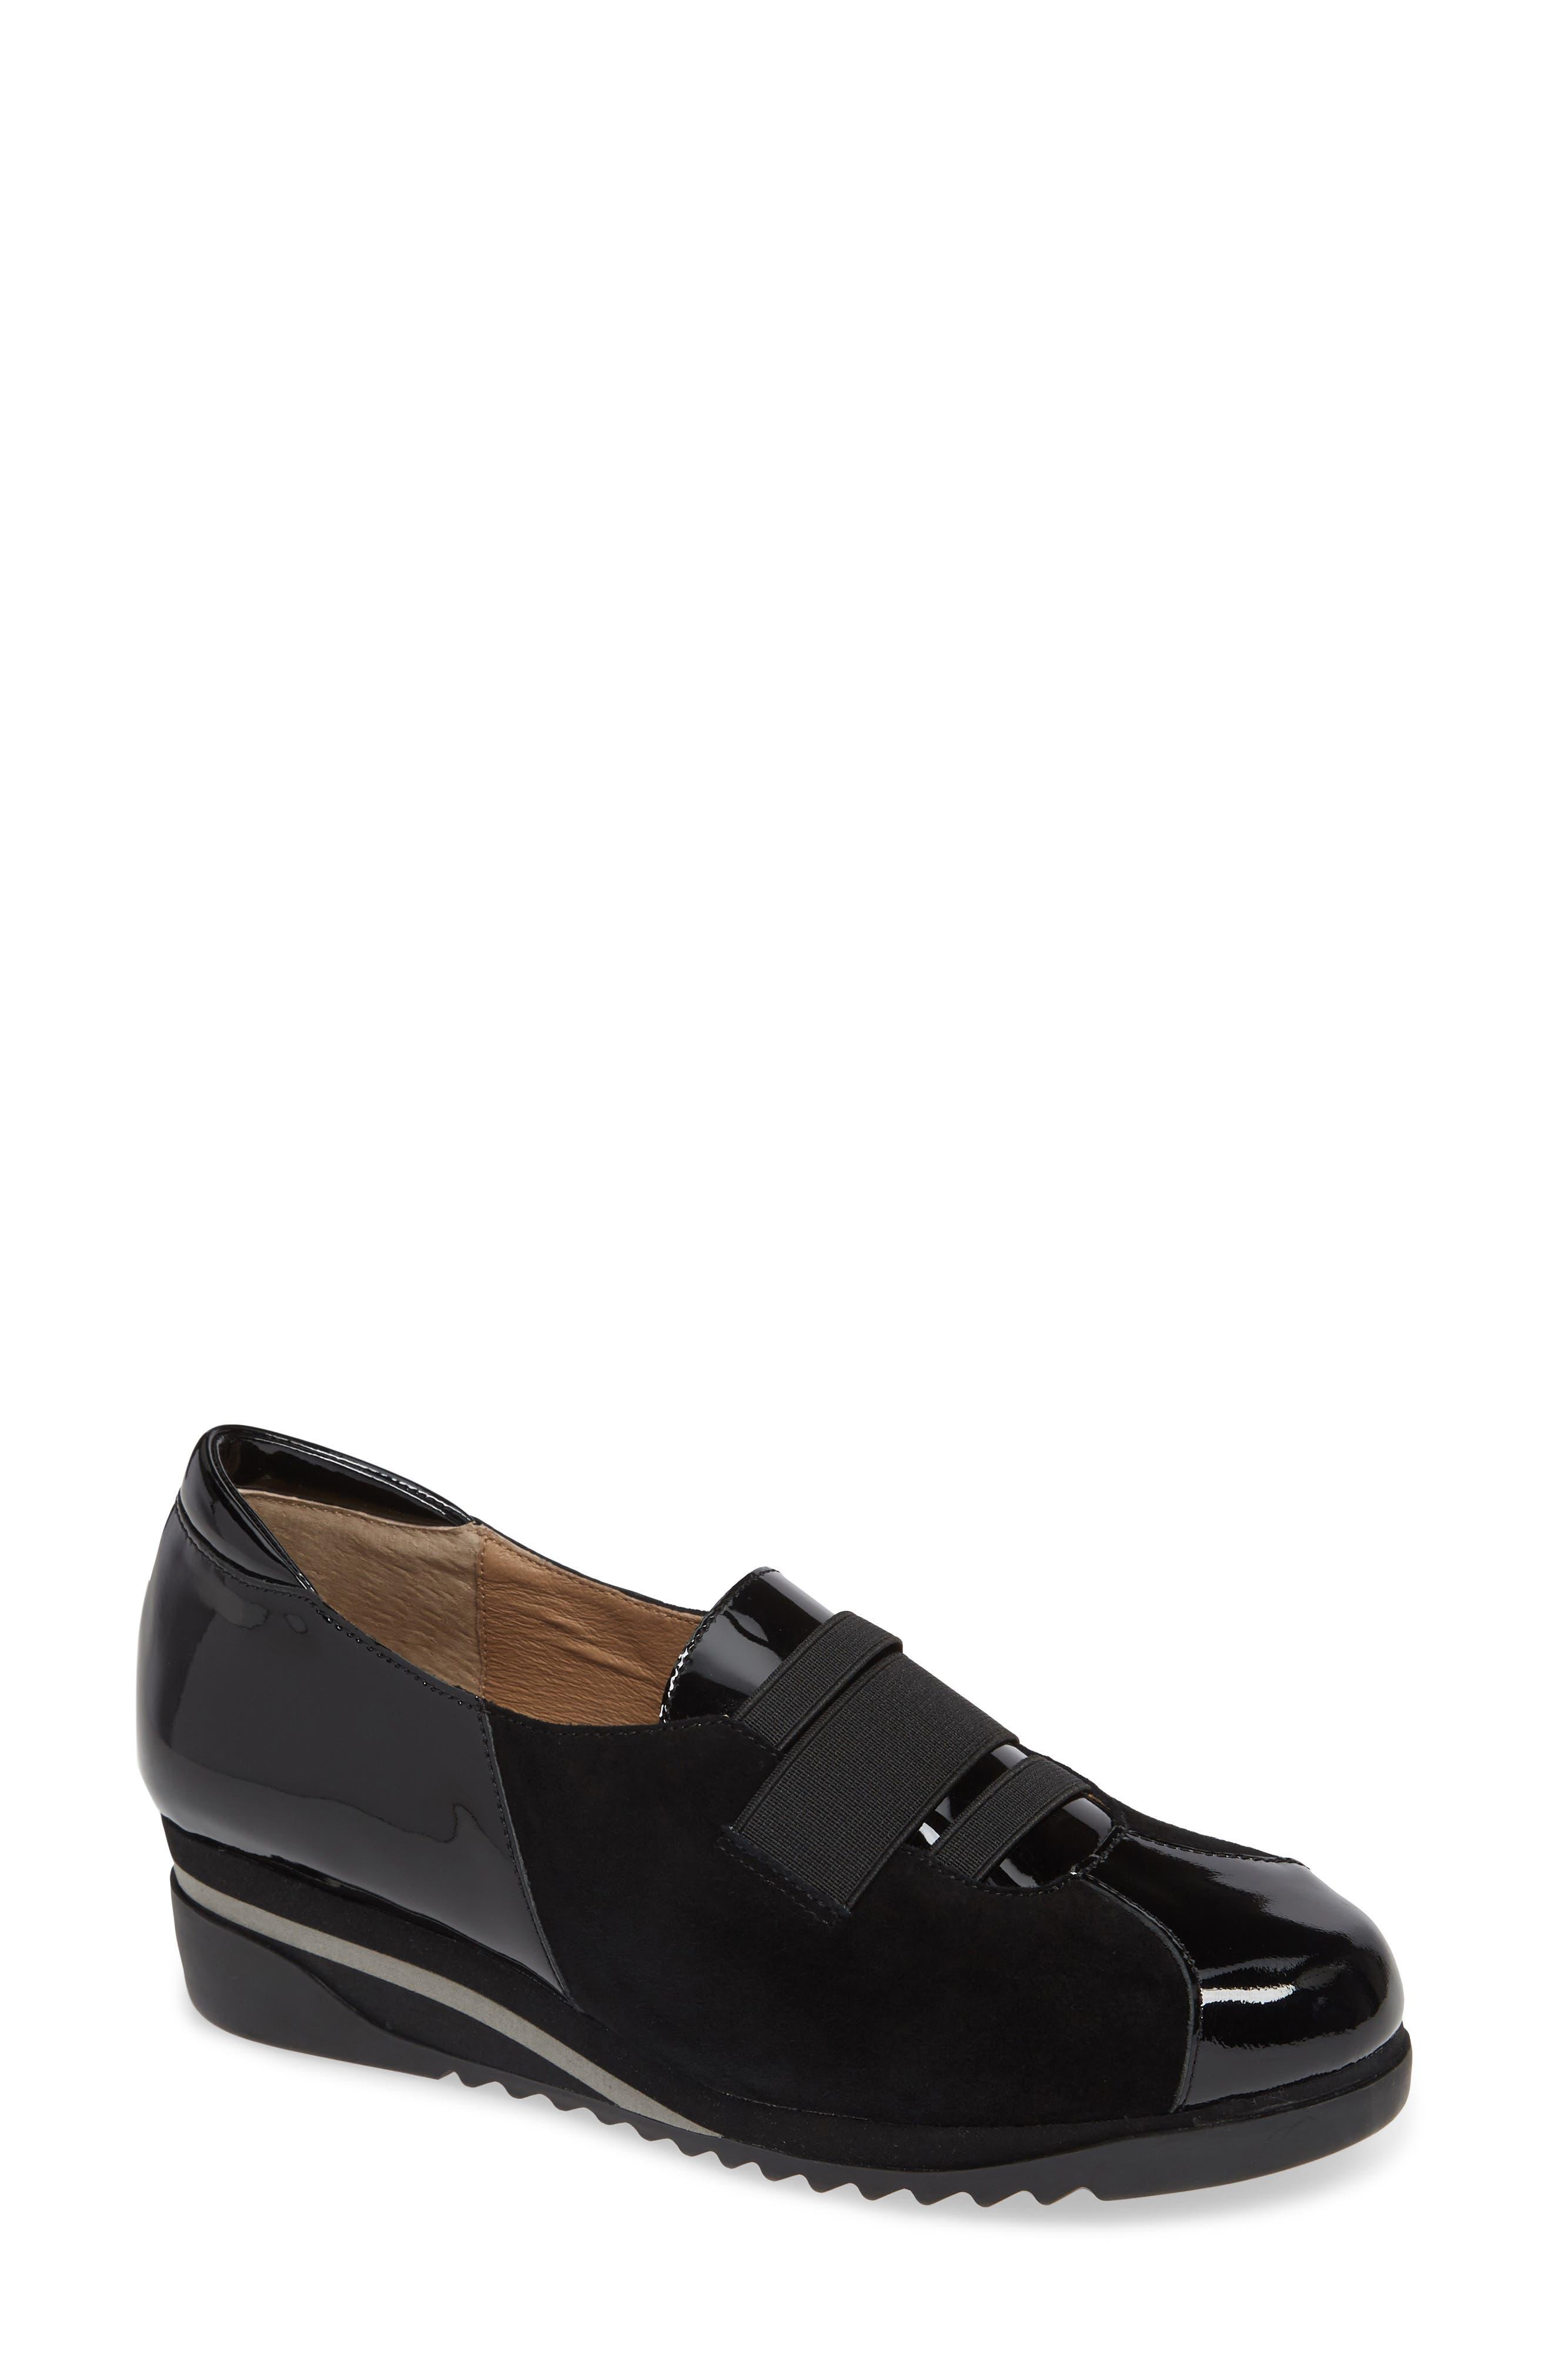 Bettye Muller Concepts Taytum Sneaker- Black